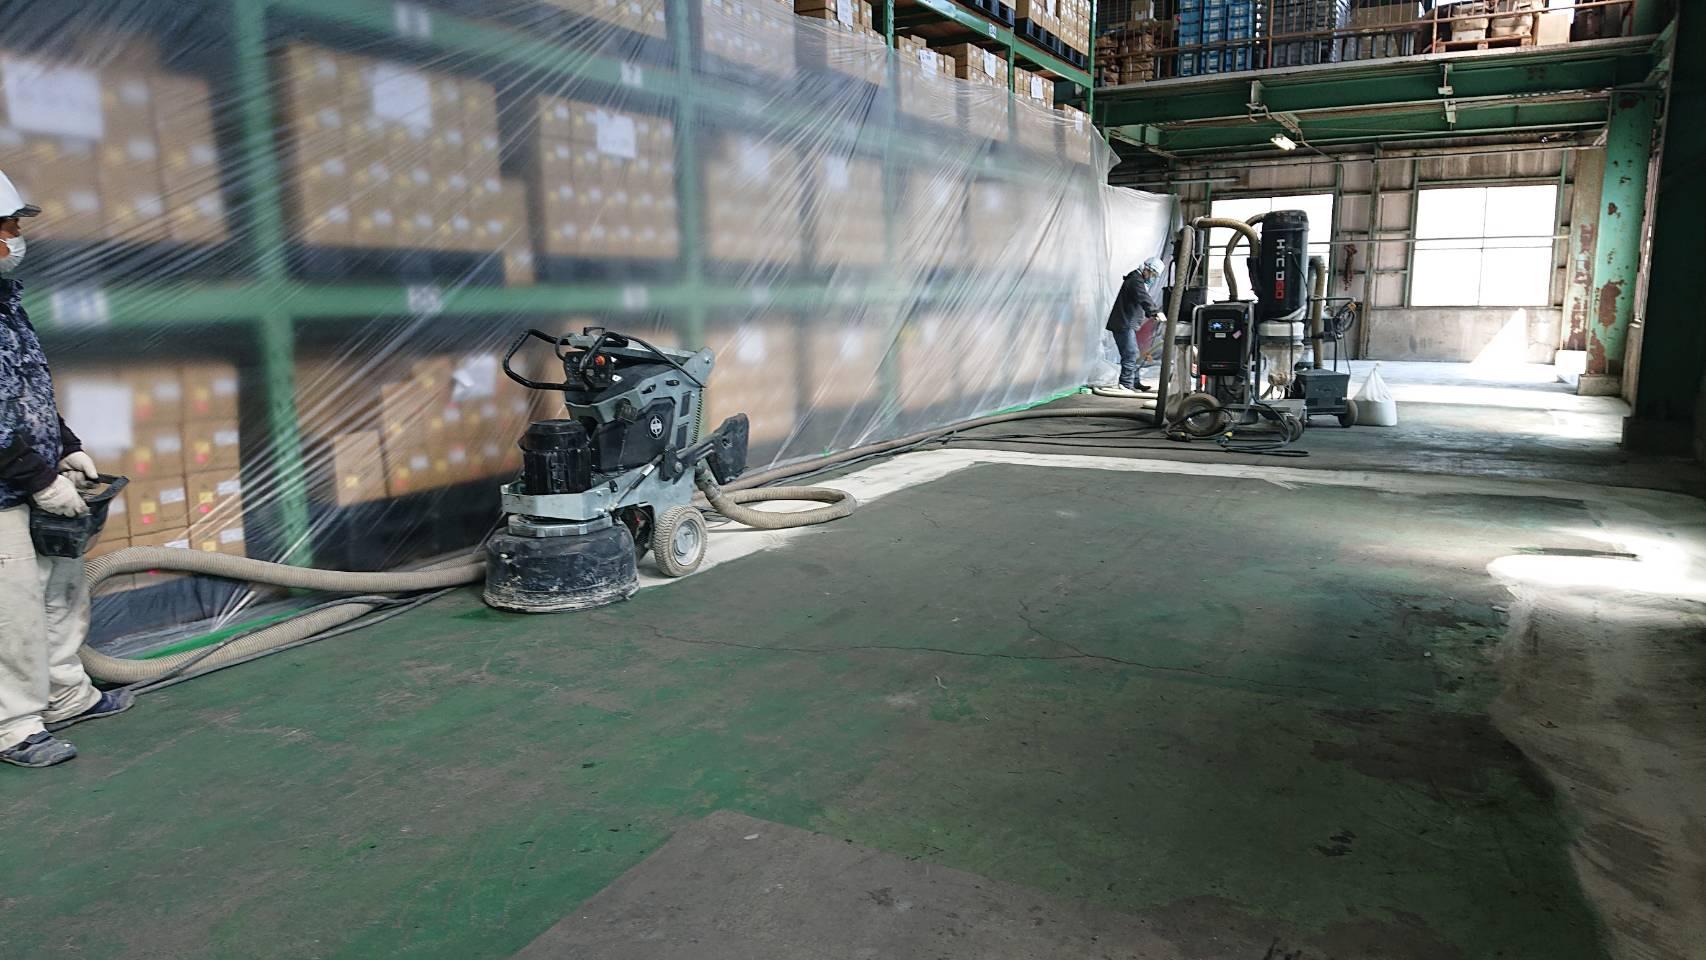 『DURATIQ8』を使って、倉庫の床の不陸改修です。